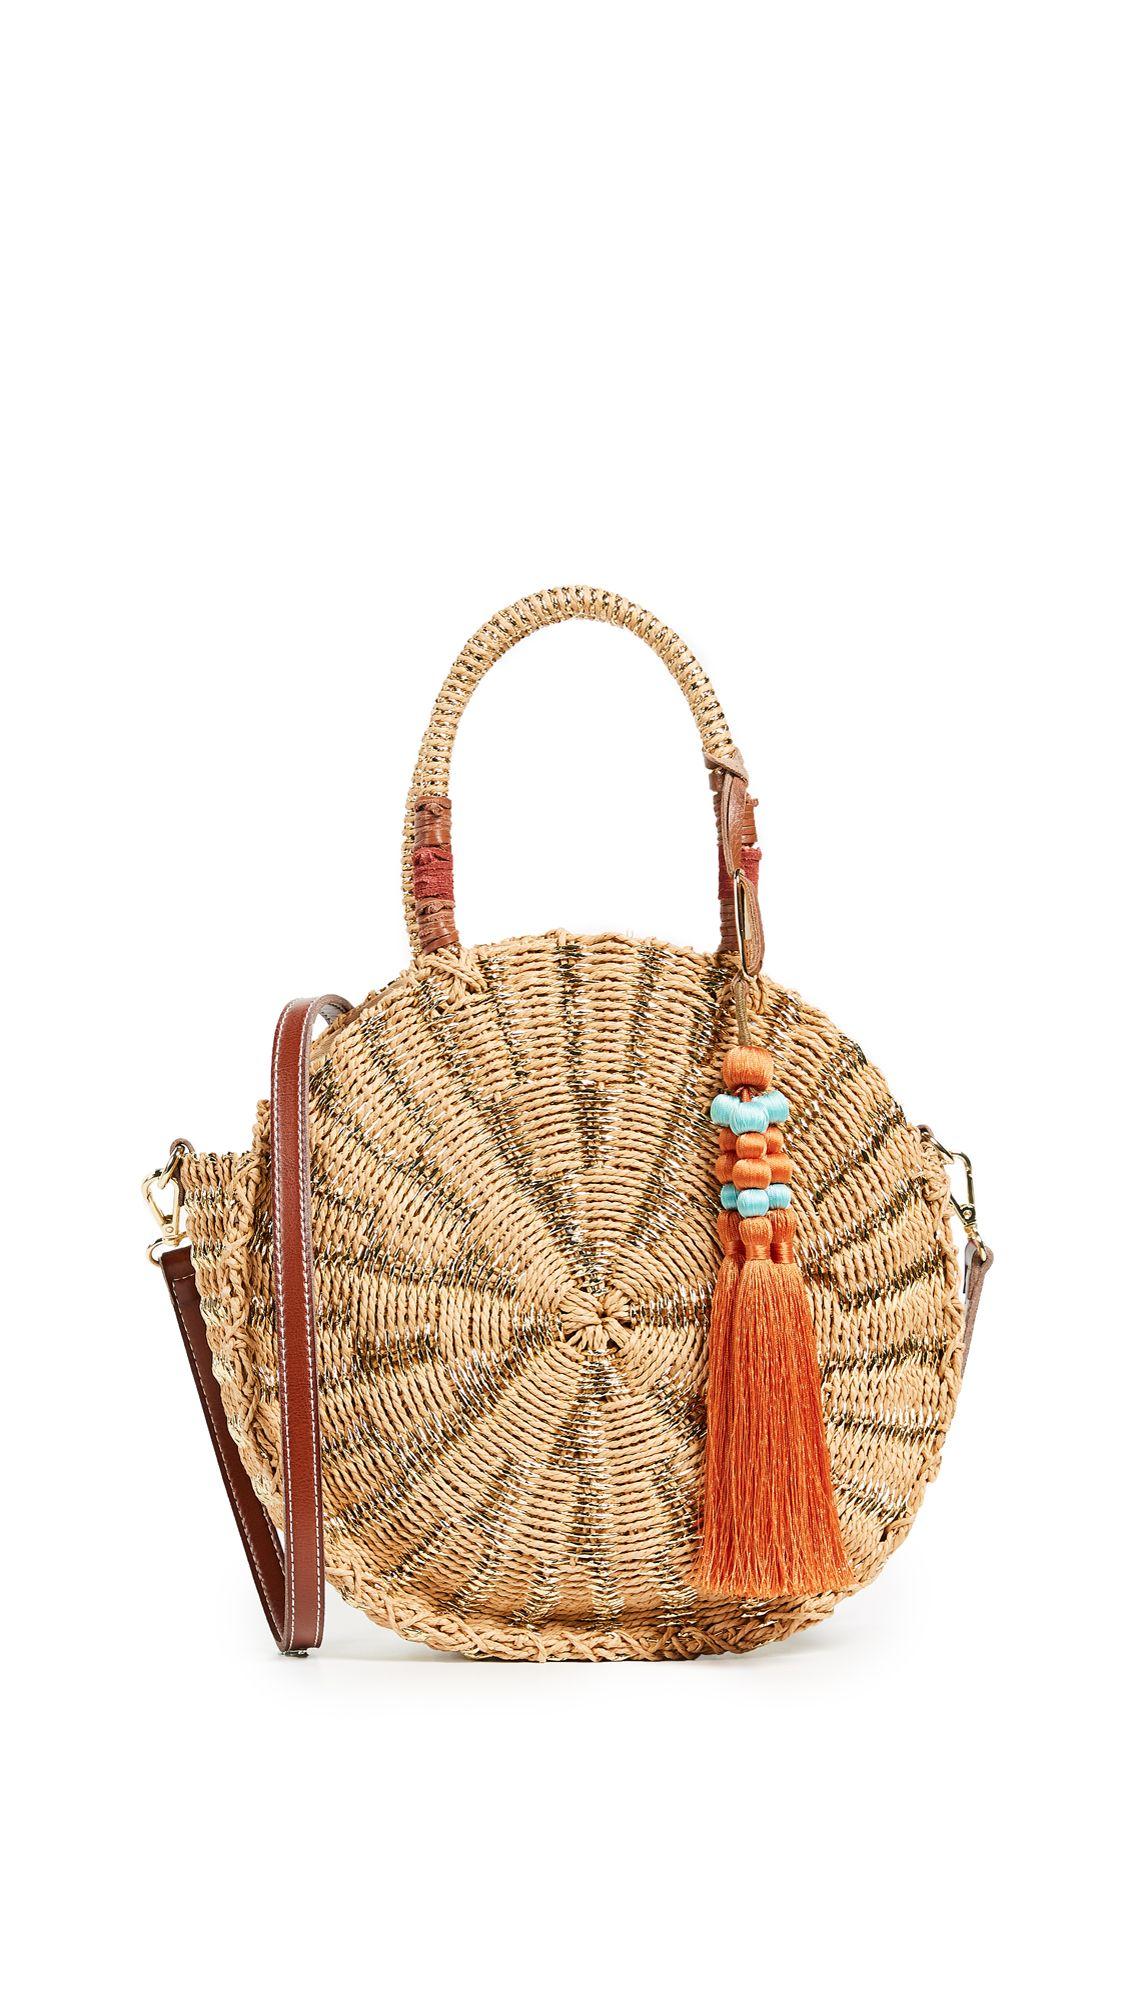 Sam Edelman Giuliana Round Straw Tote Samedelman Bags Shoulder Hand